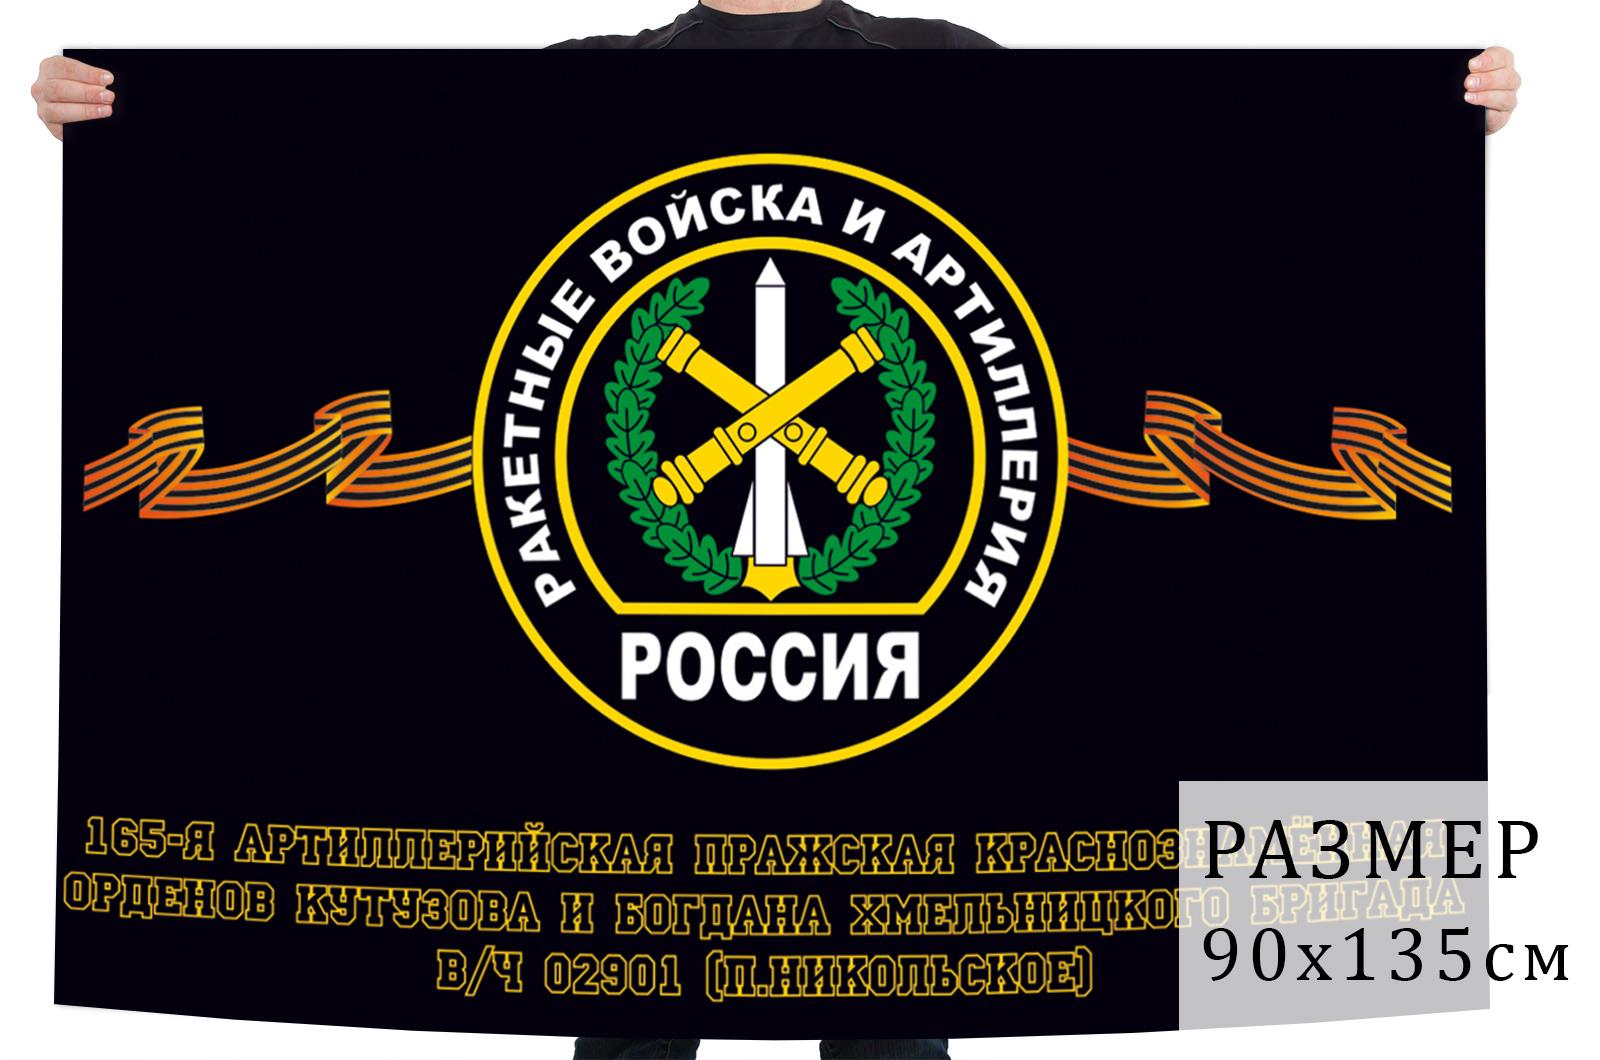 Флаг РВиА 165 Пражской артиллерийской бригады